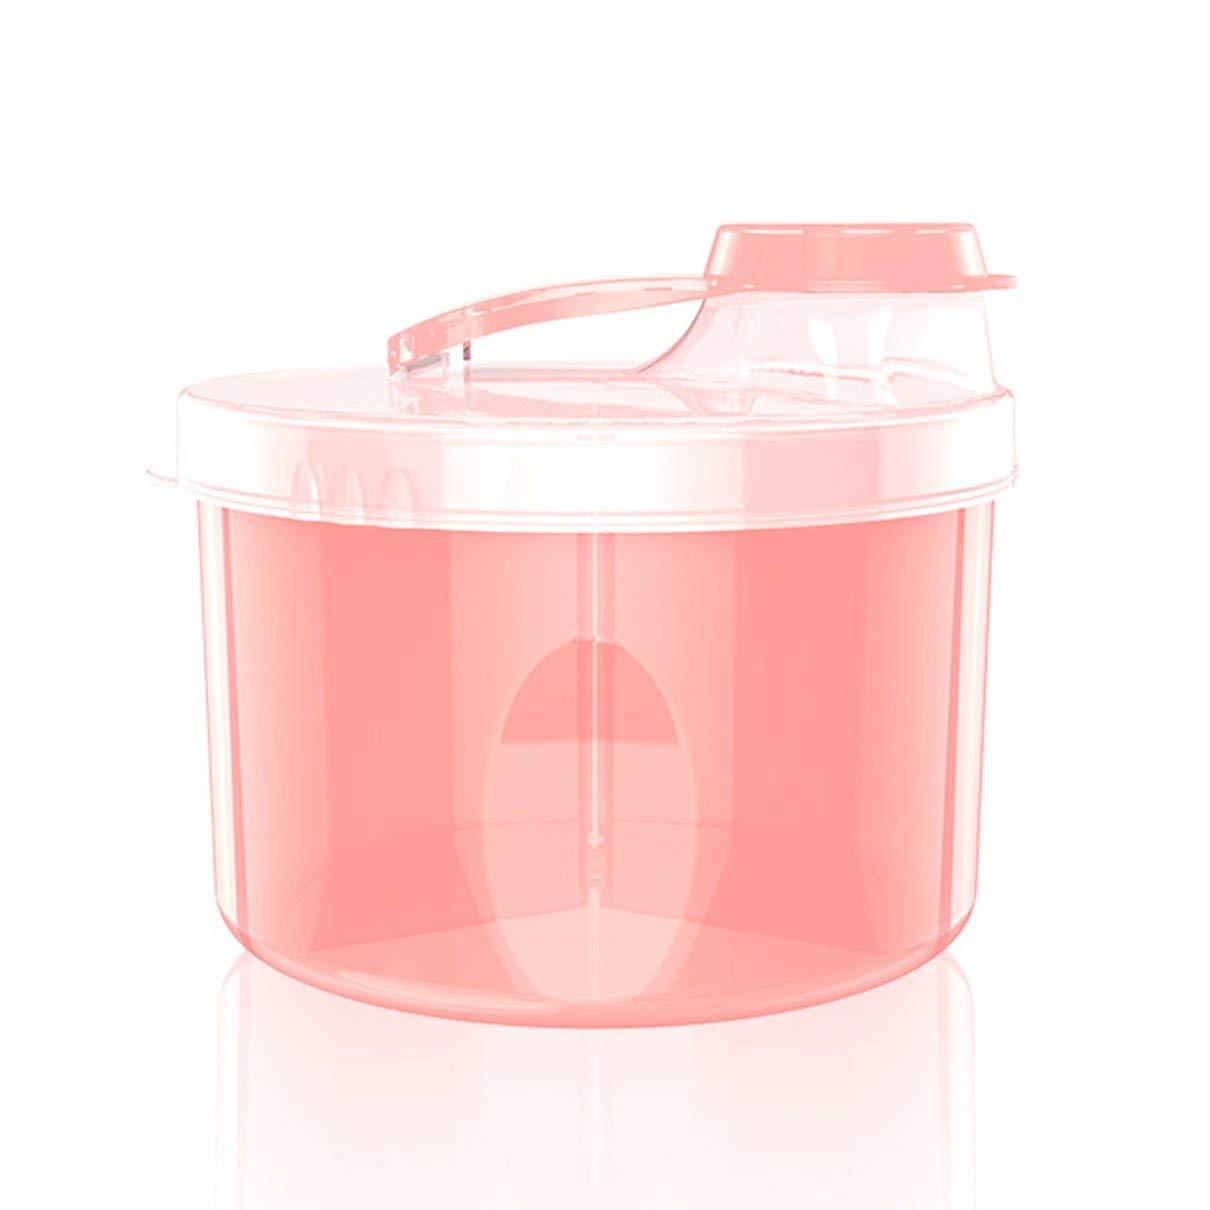 Azul Togames Beb/é port/átil Ni/ños Contenedores de comida Almacenamiento Caja de alimentaci/ón Dispensador de f/órmula de leche en polvo